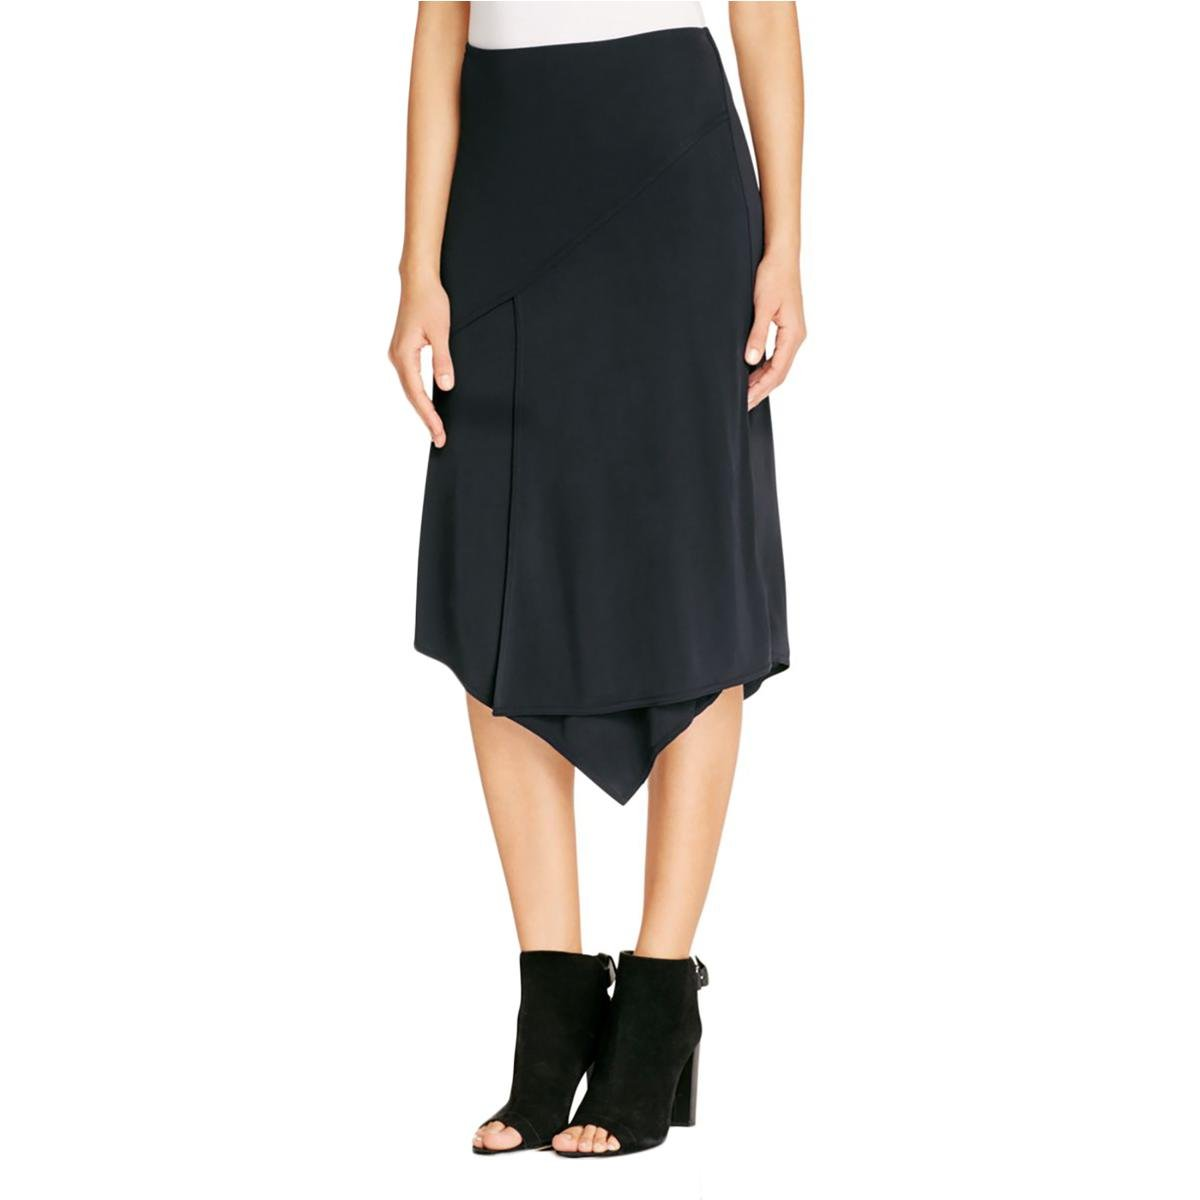 DKNY Womens Layered Jersey Asymmetrical Skirt Navy S